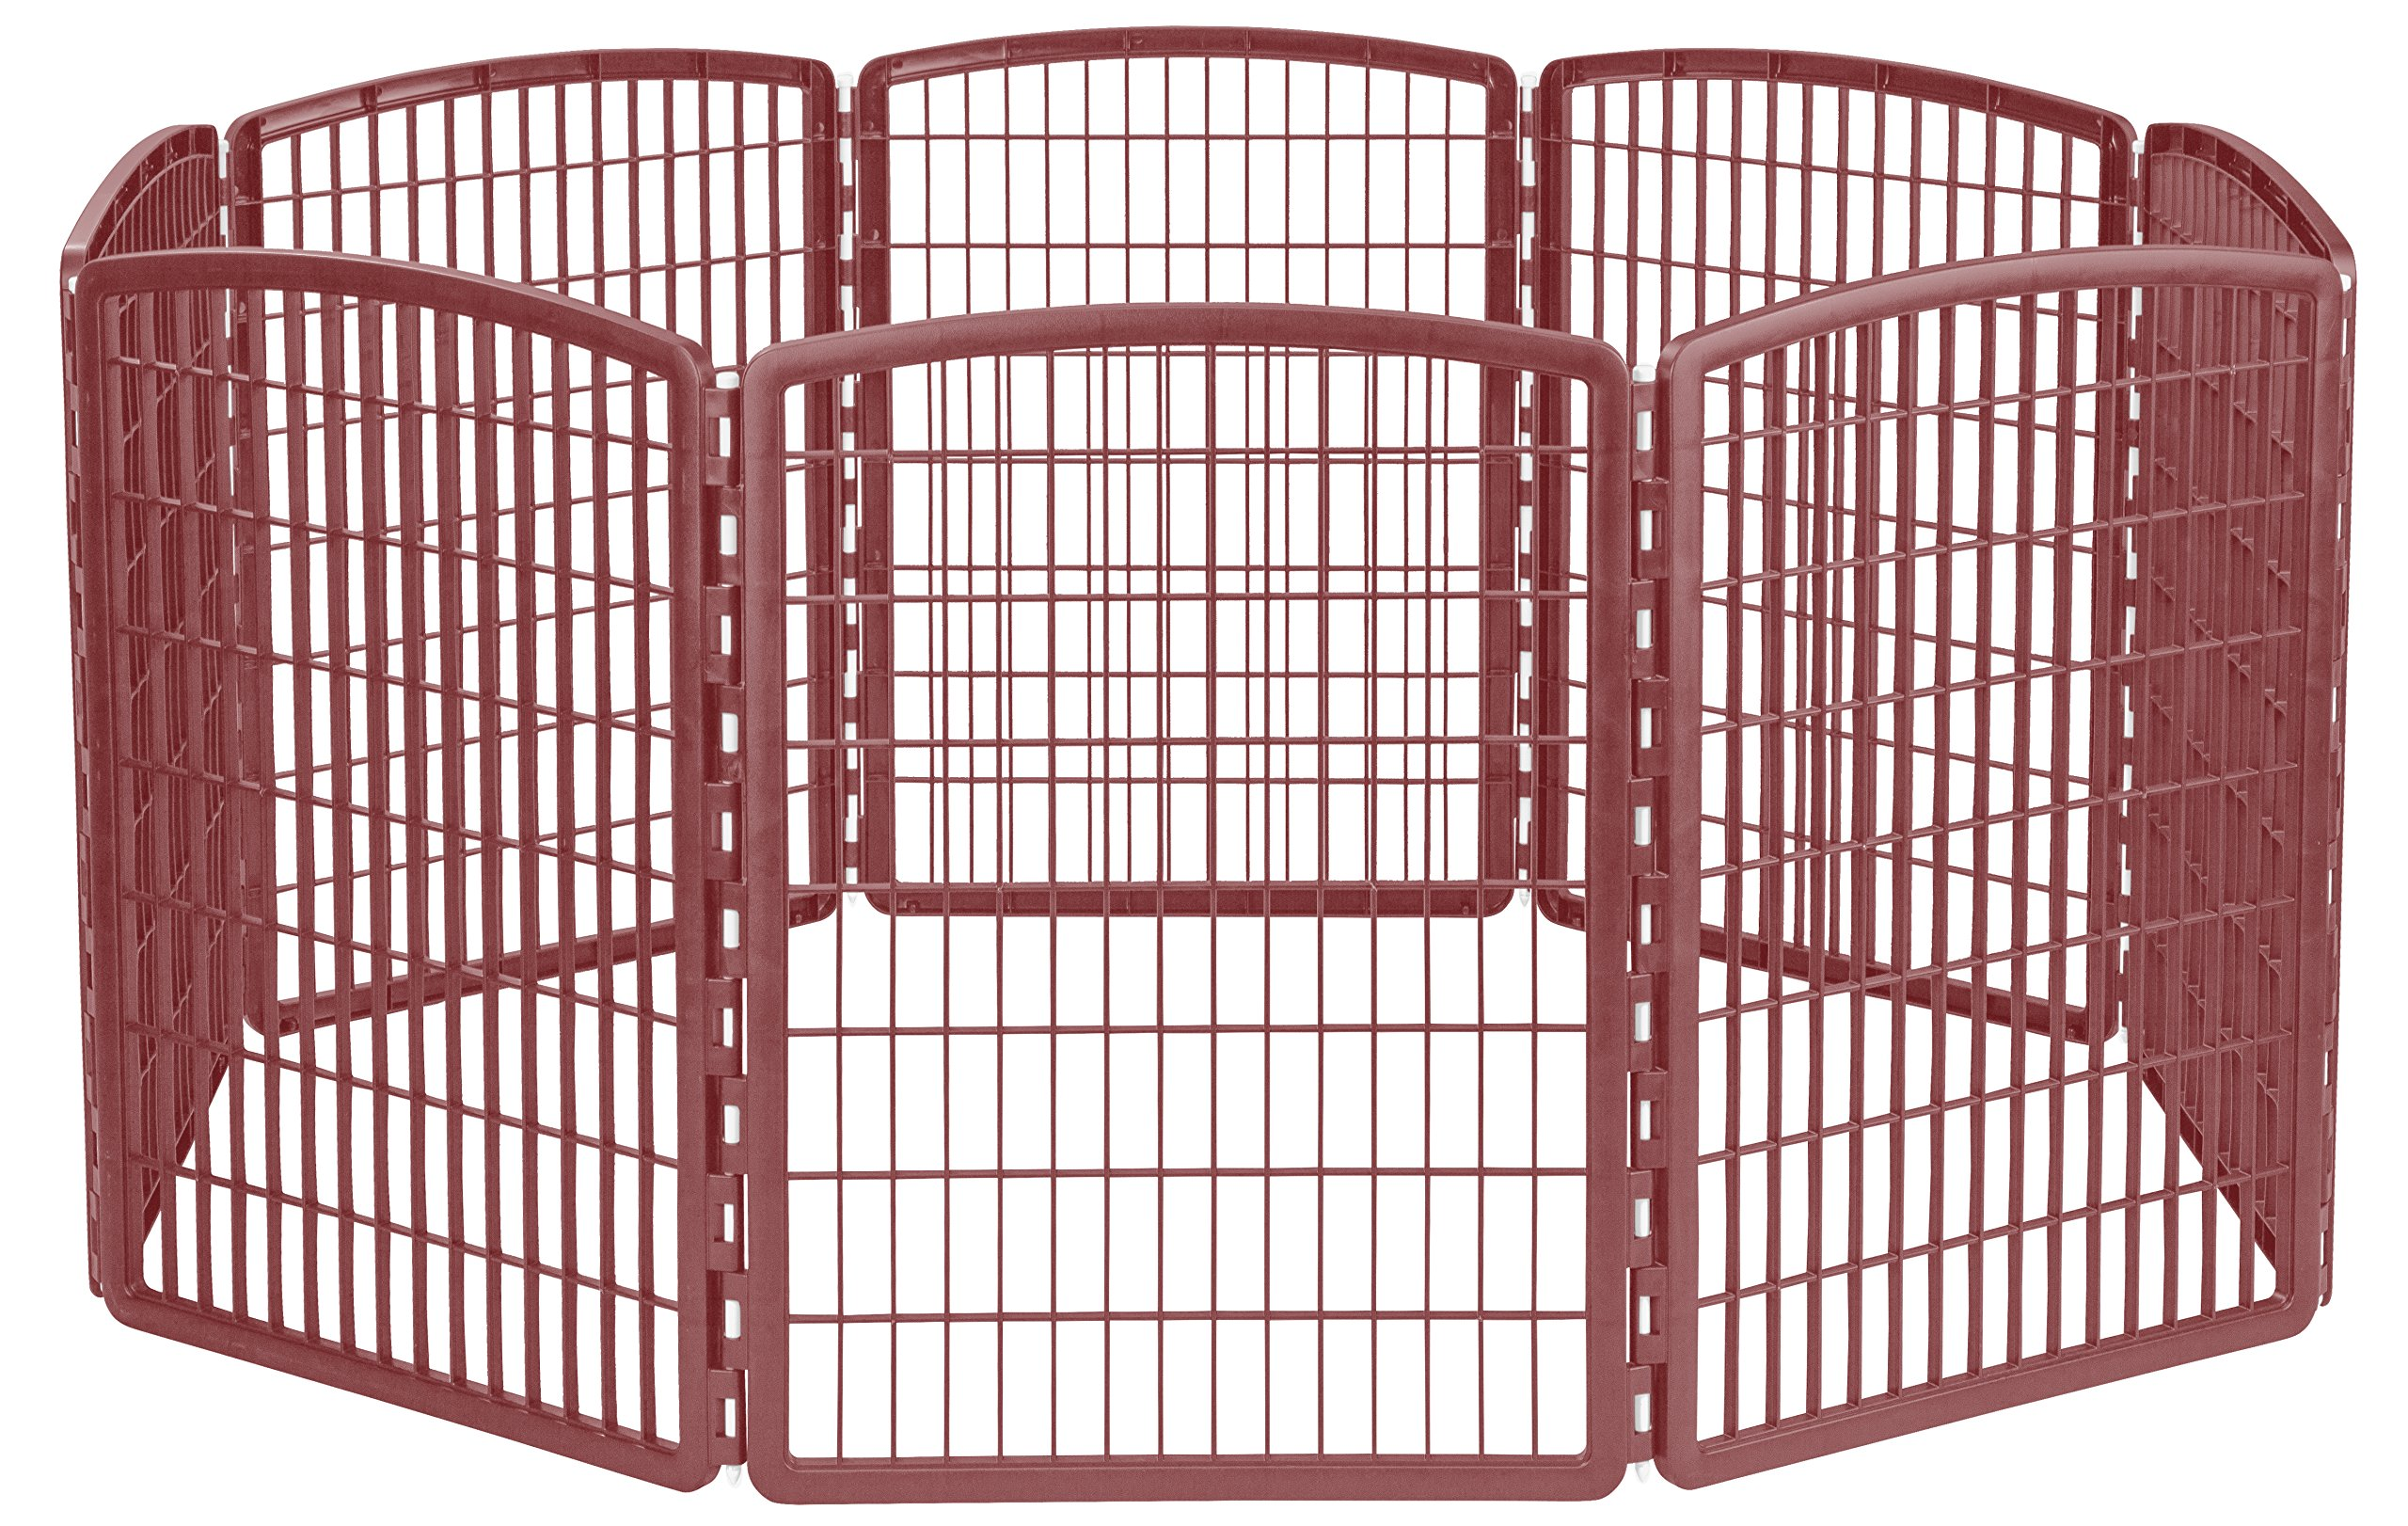 IRIS 34'' Exercise 8-Panel Pet Playpen without Door, Brown by IRIS USA, Inc.